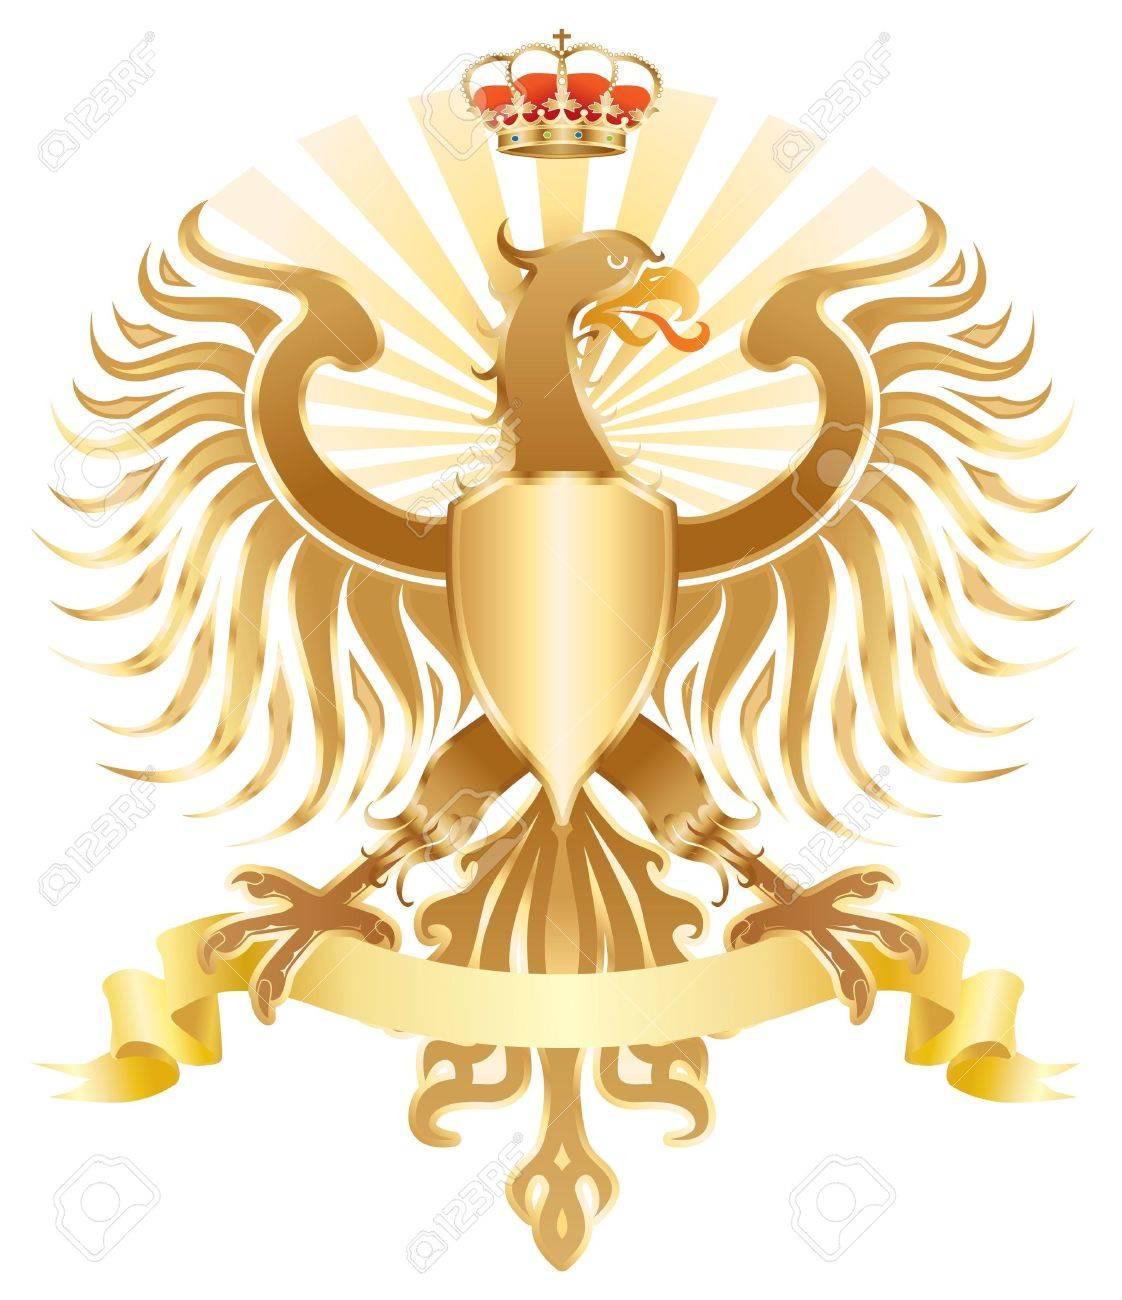 Original Golden Eagle Crest Color Version Stock Photo Picture And